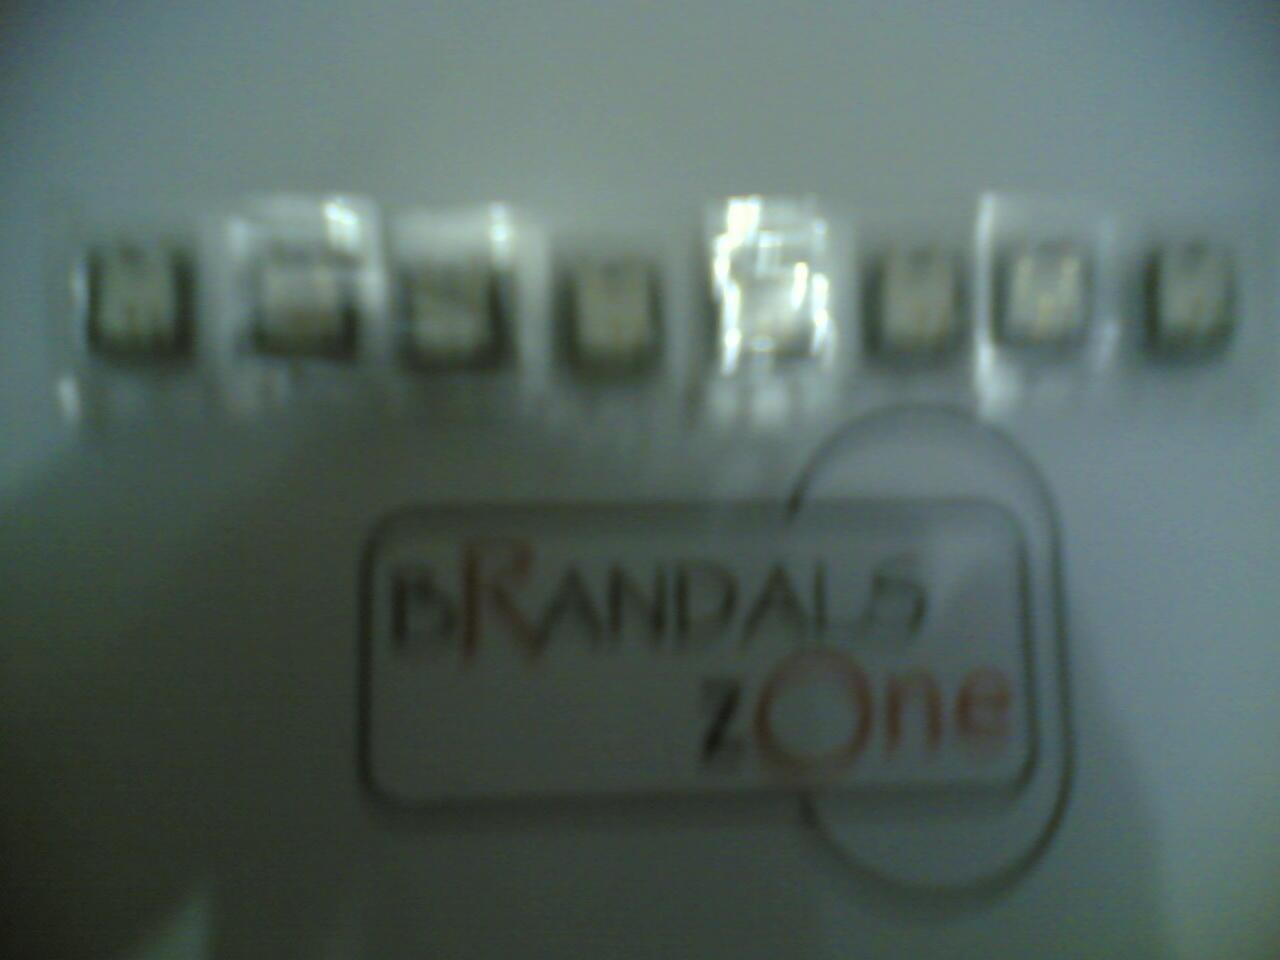 UI BOARD NOKIA N79